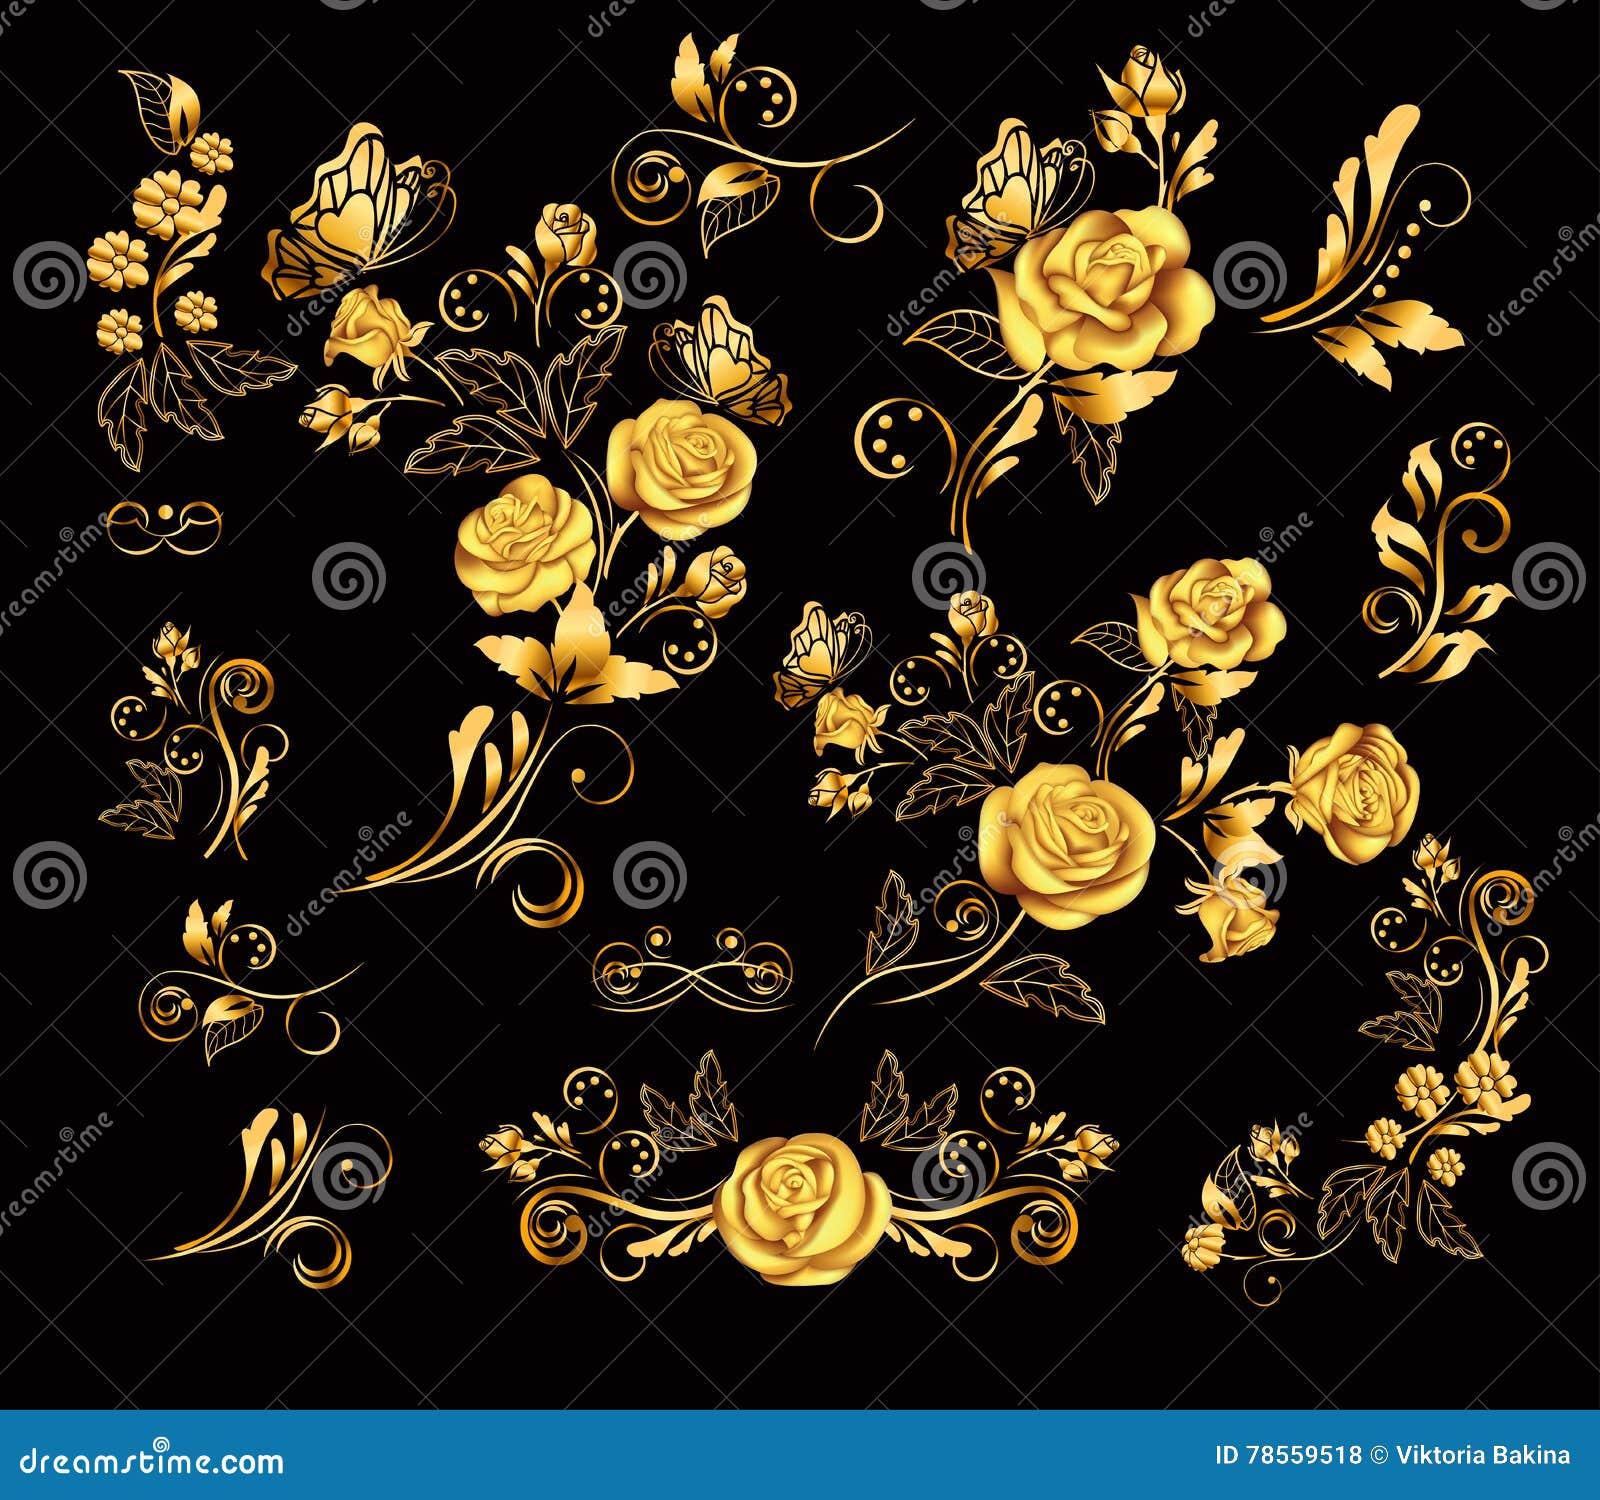 Flowers.Vector illustration with gold roses. Vintage decoration. Decorative, ornate, antique, luxury, floral elements